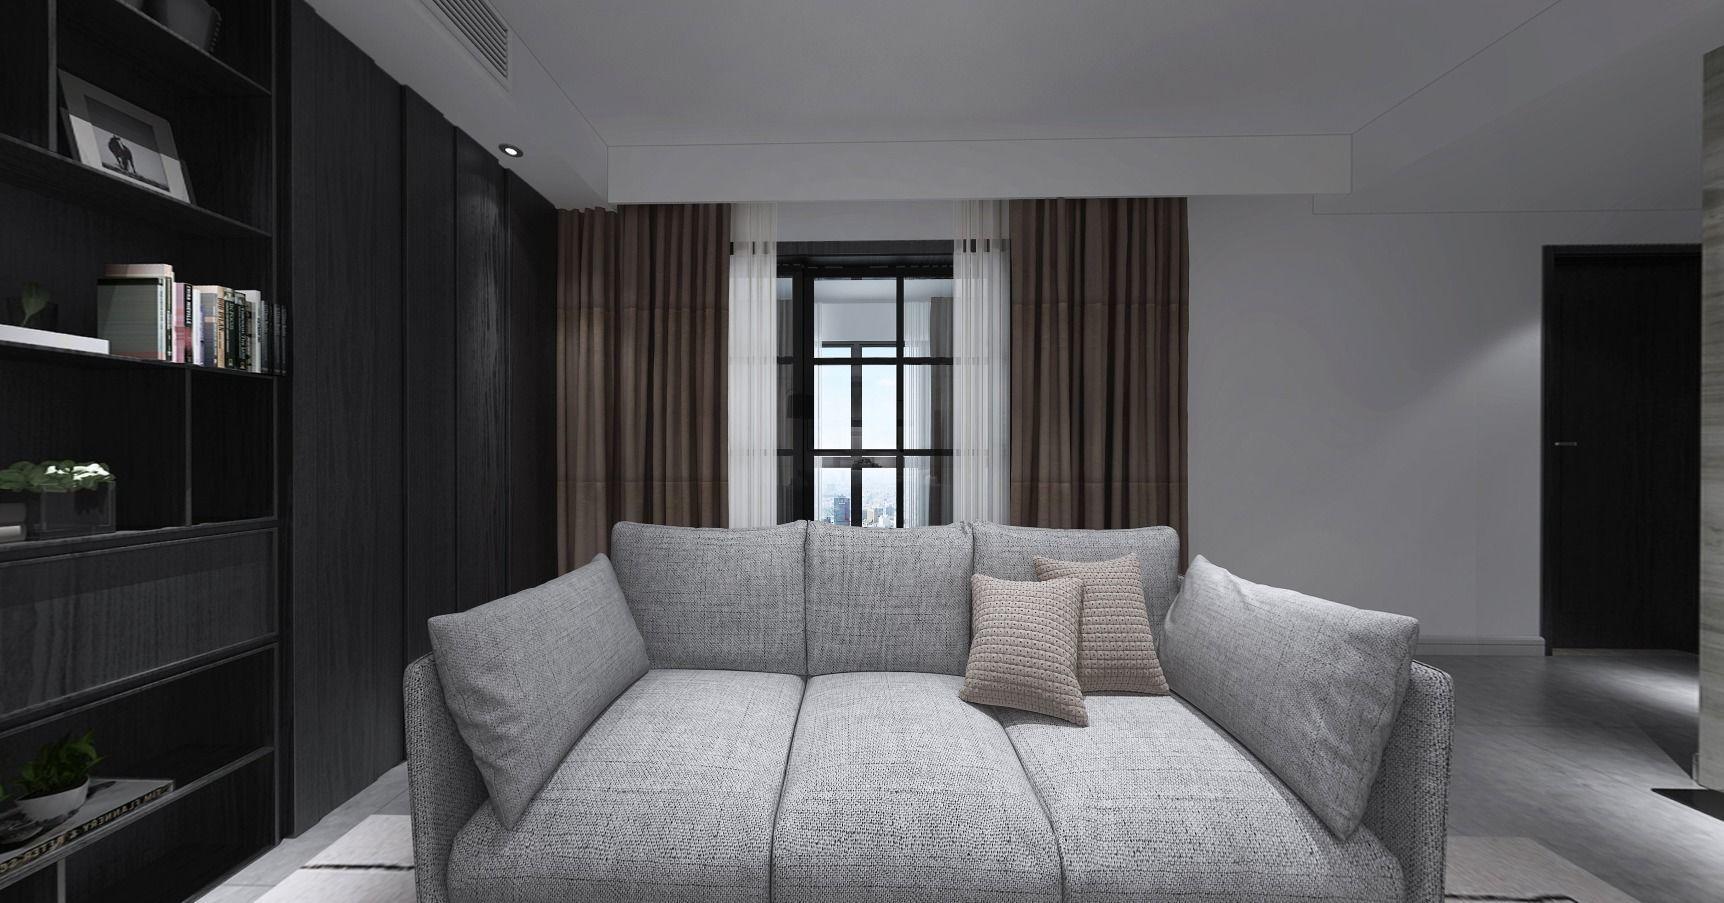 Apartment Modern Sofa European Style Living Room 3d Model Max